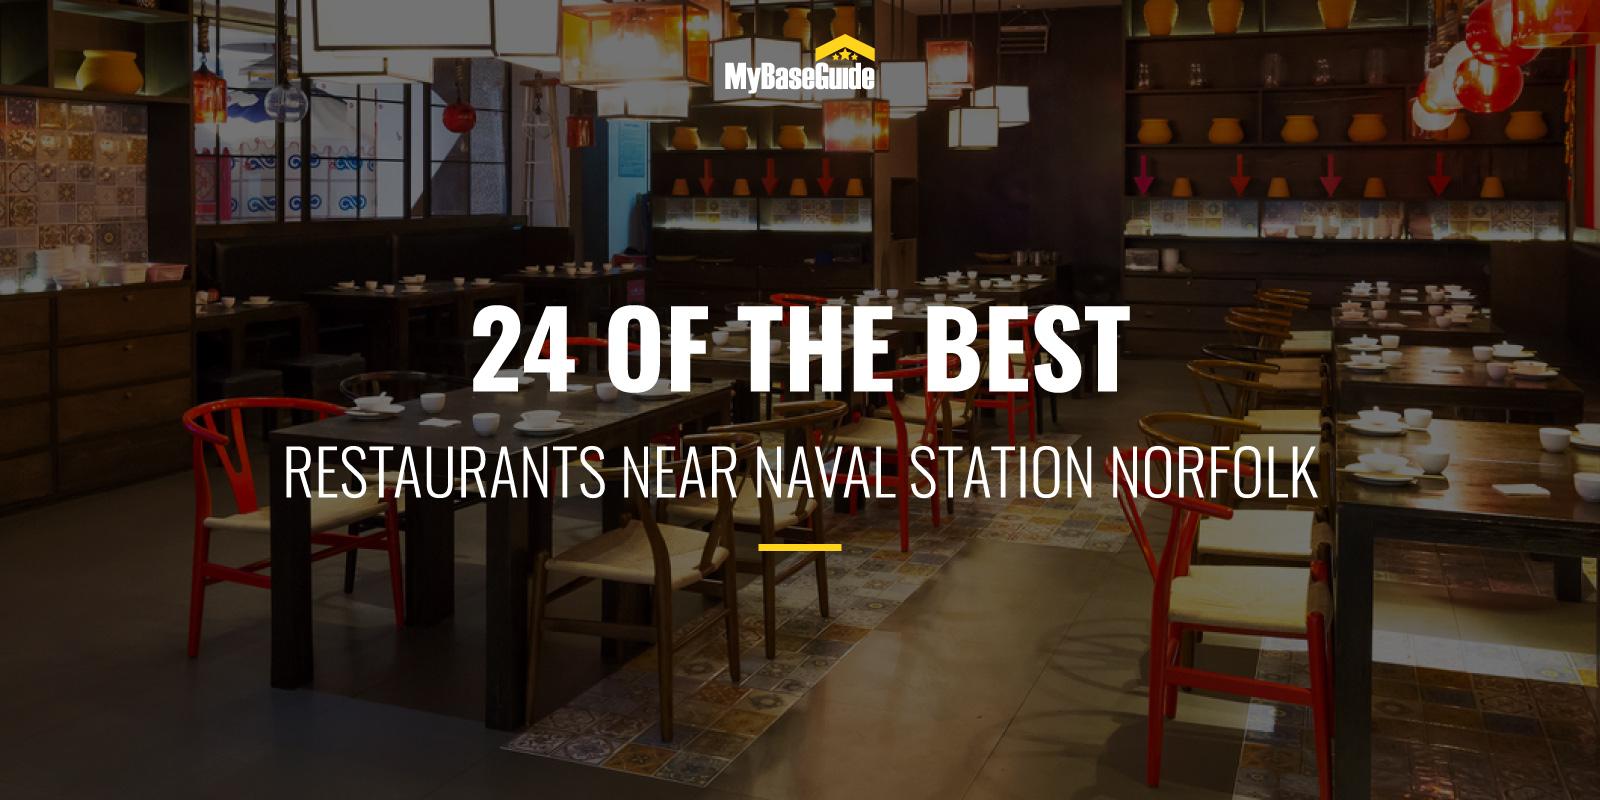 24 Of the Best Restaurants Near Naval Station Norfolk